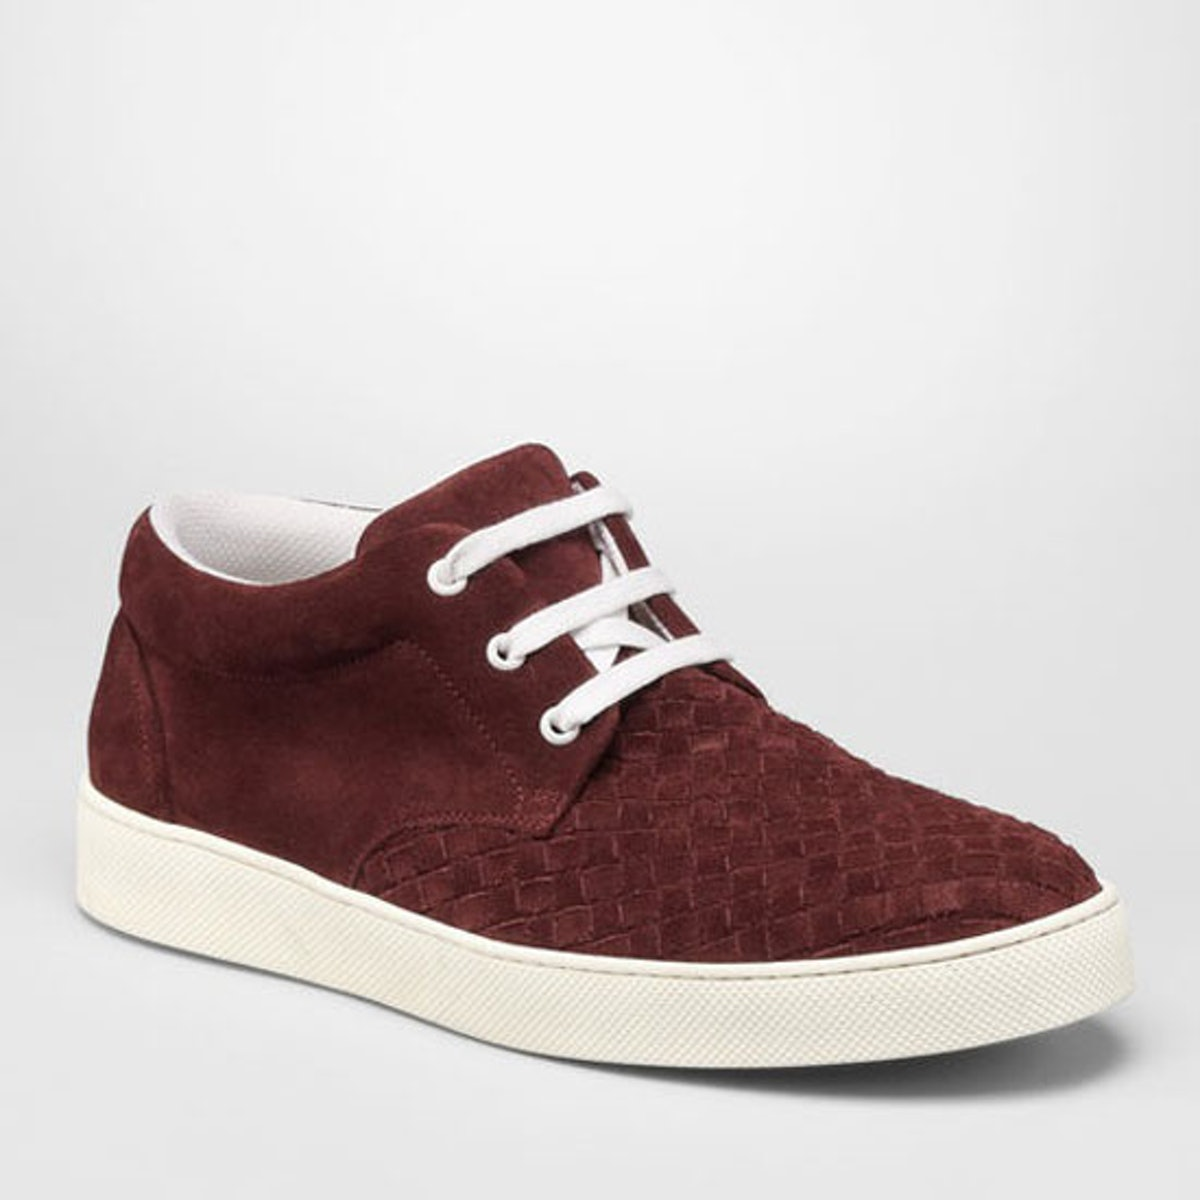 blog-sneakers-03-Bottega-Veneta.jpg